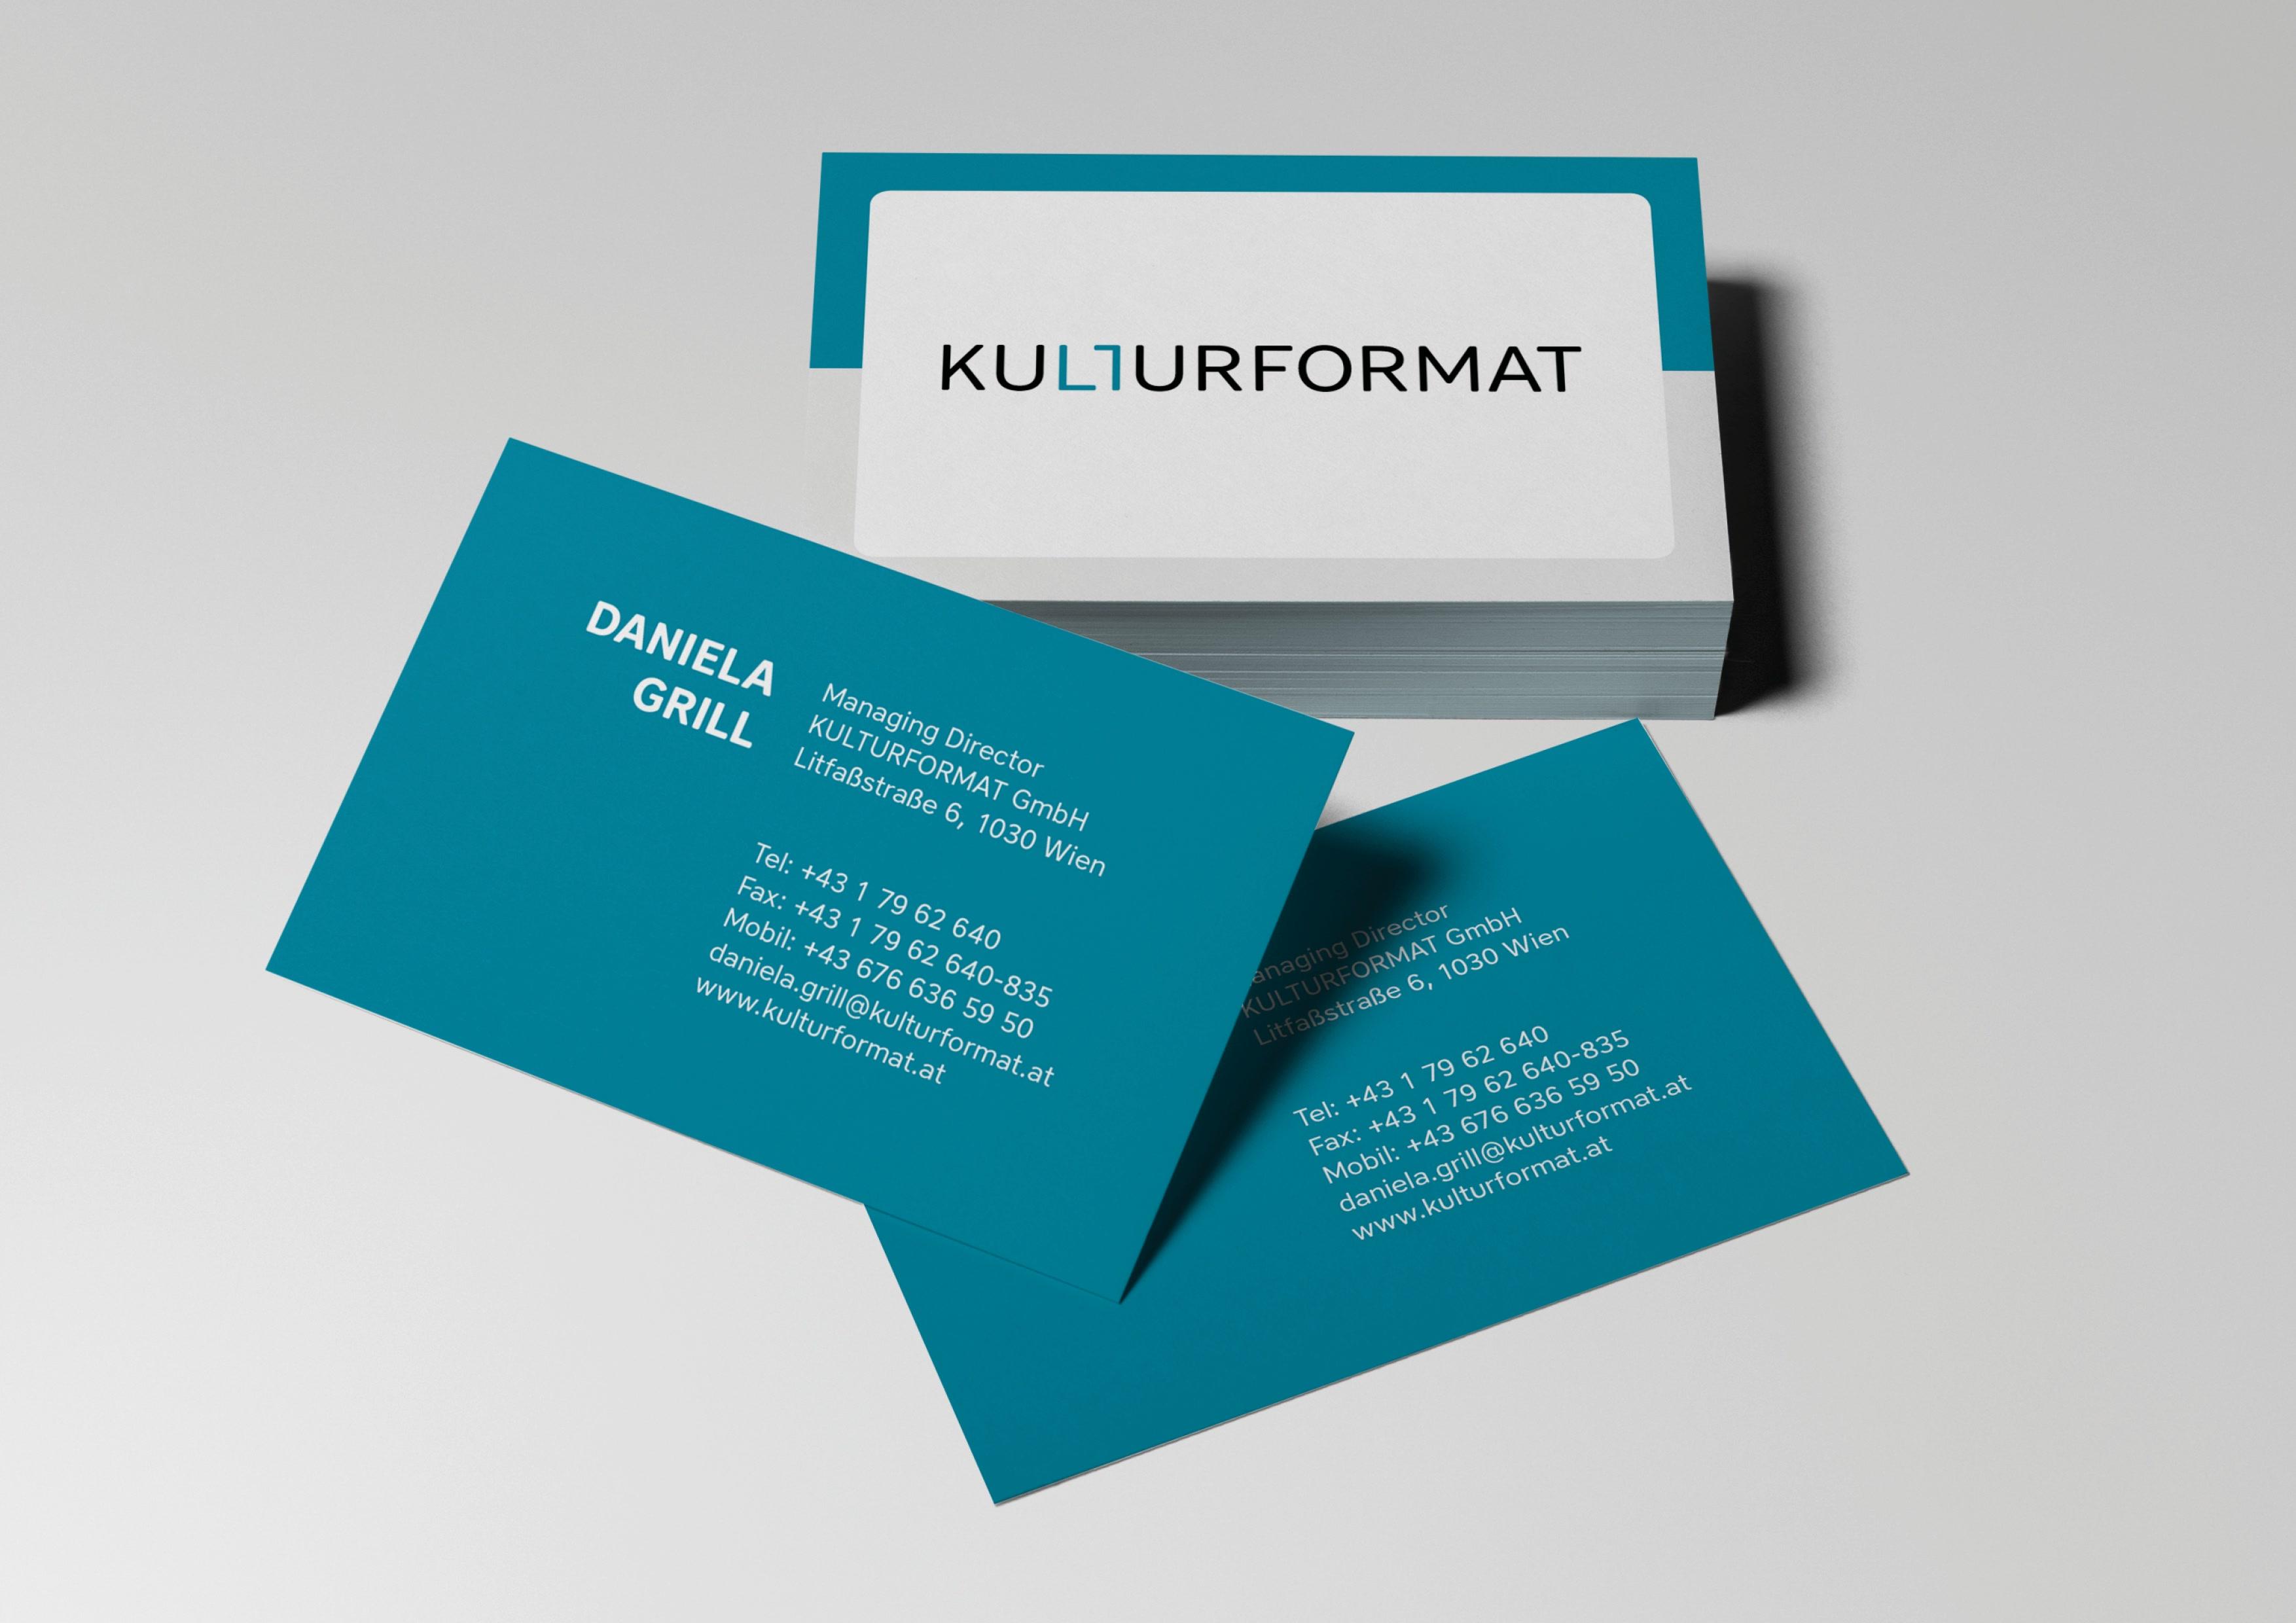 Projektdatei_ KULTURFORMAT7(1)